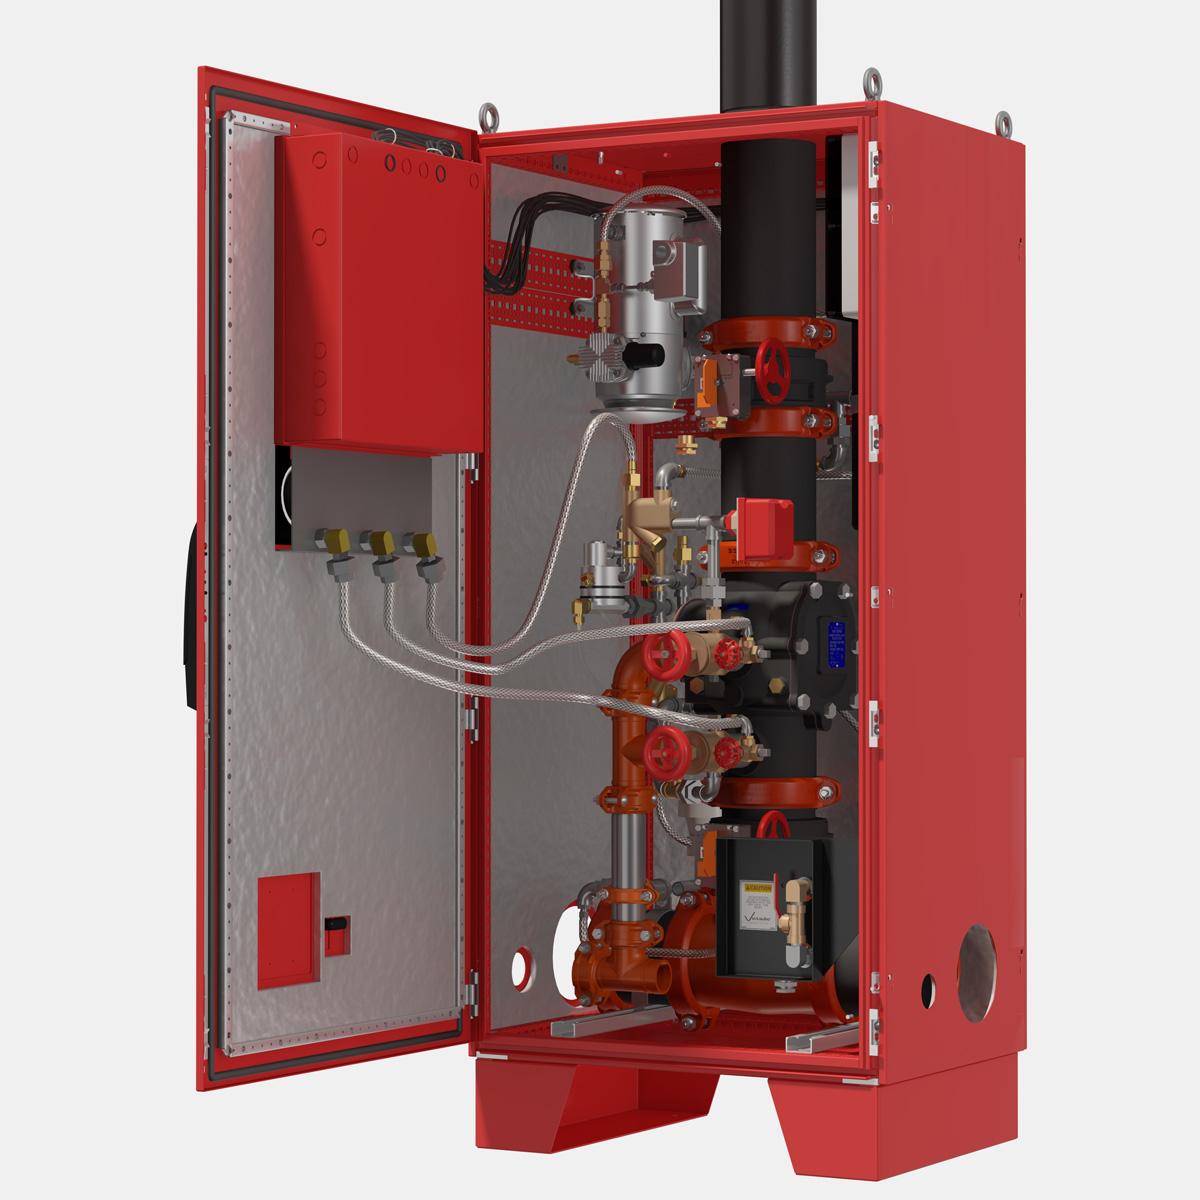 Victaulic Announces New FireLock Series 745 FirePac